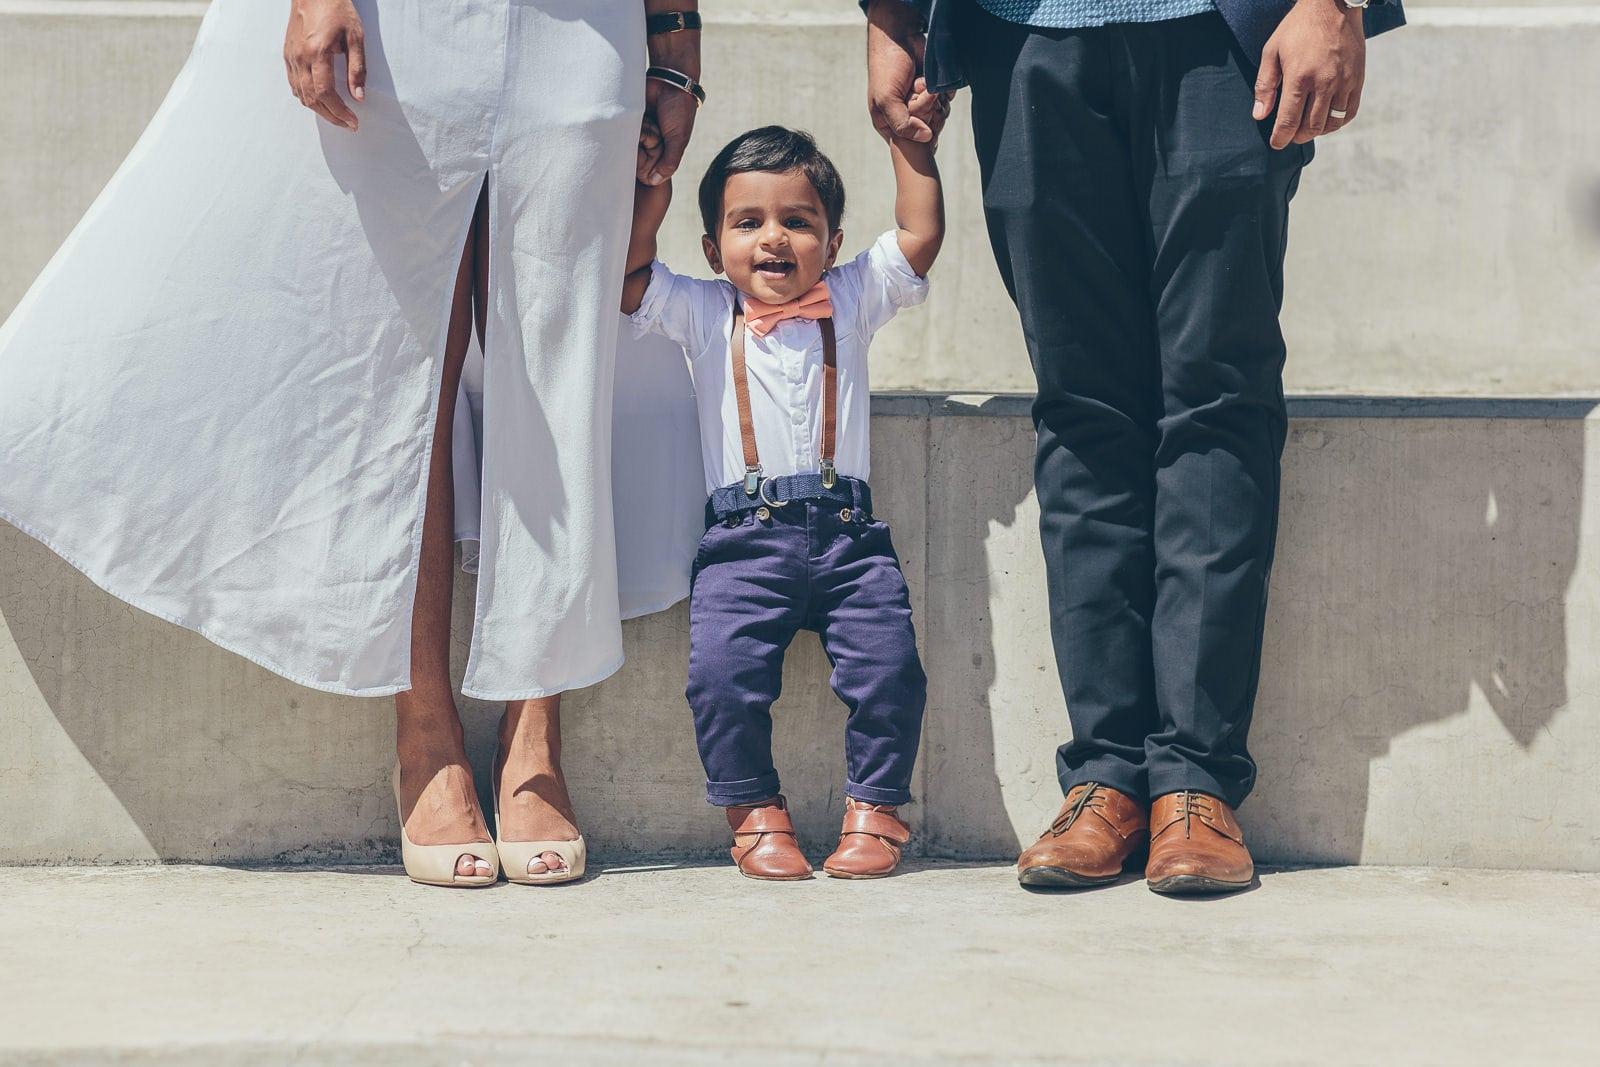 Kids and Baby shoots in Vermont - Child standing between parents